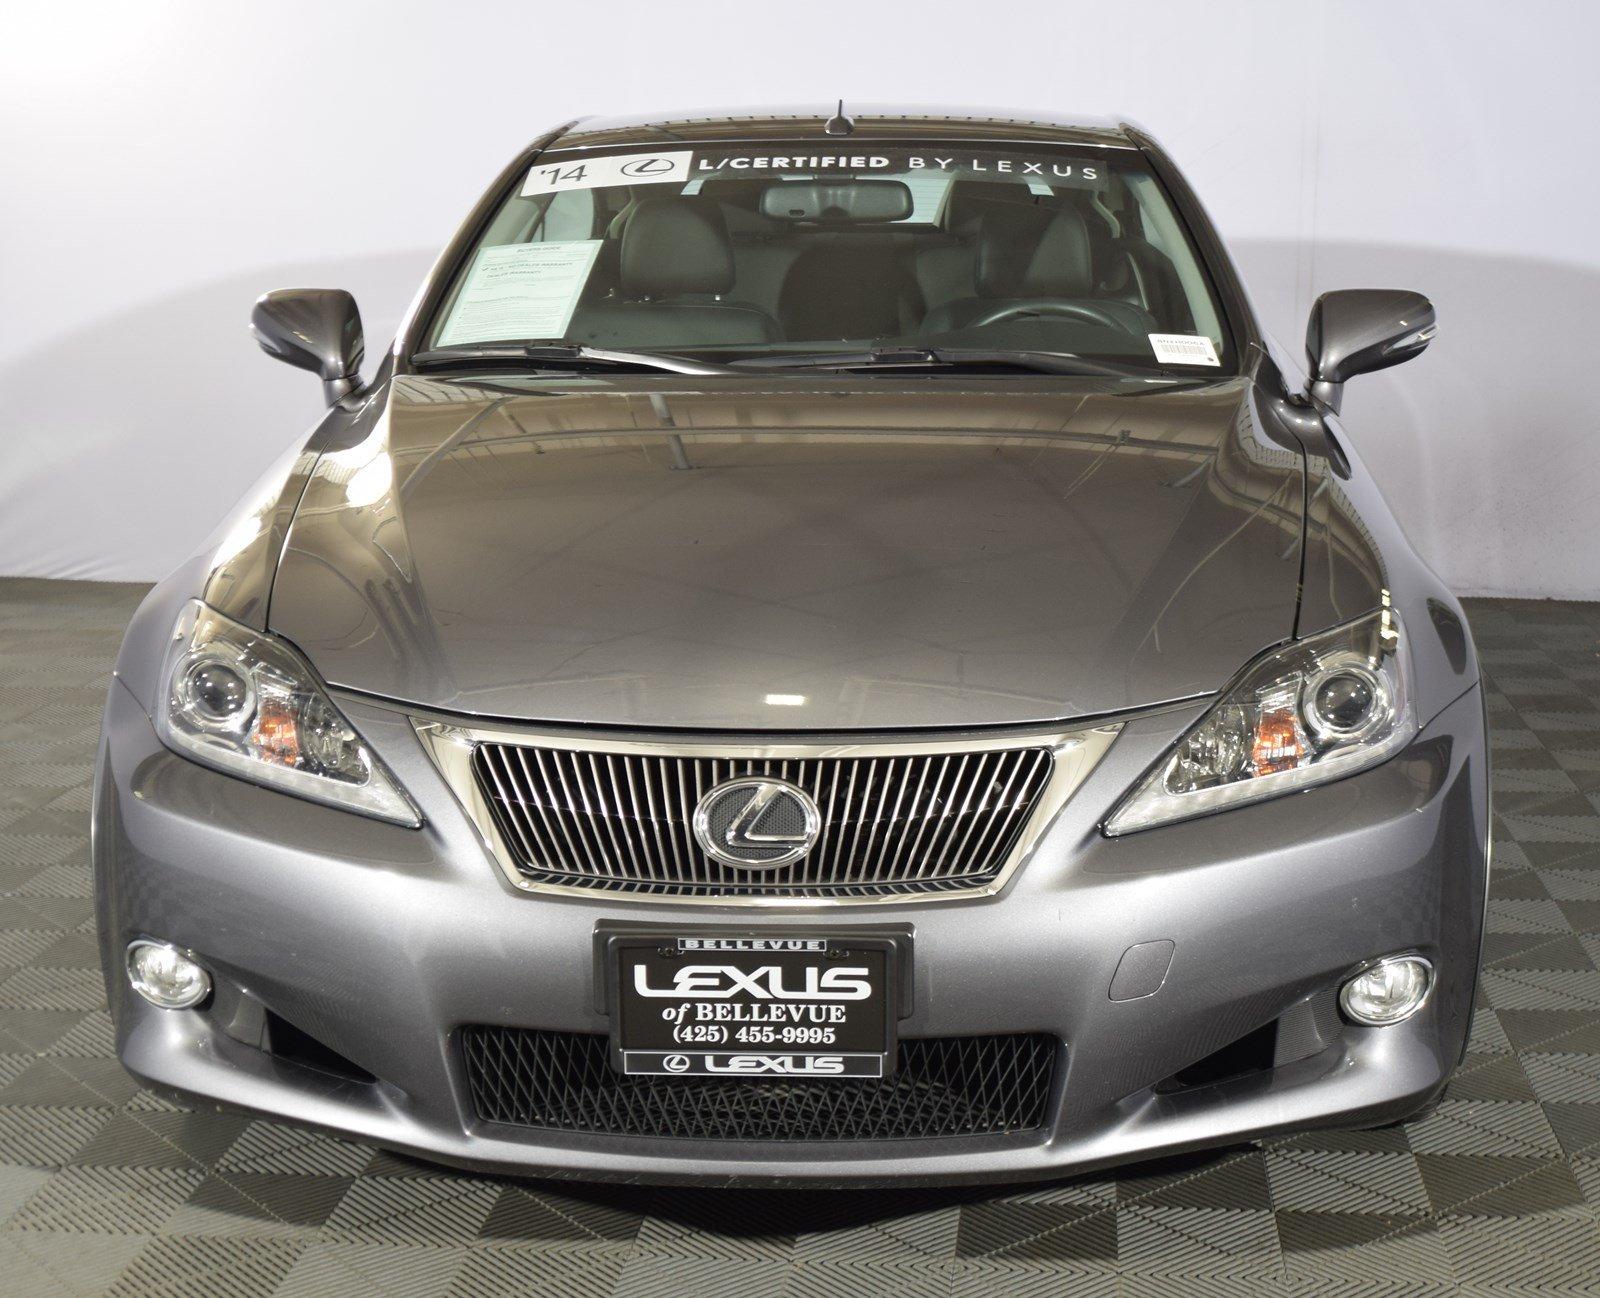 2014 Lexus Is 250 Sedan For Sale ▷ Used Cars Buysellsearch